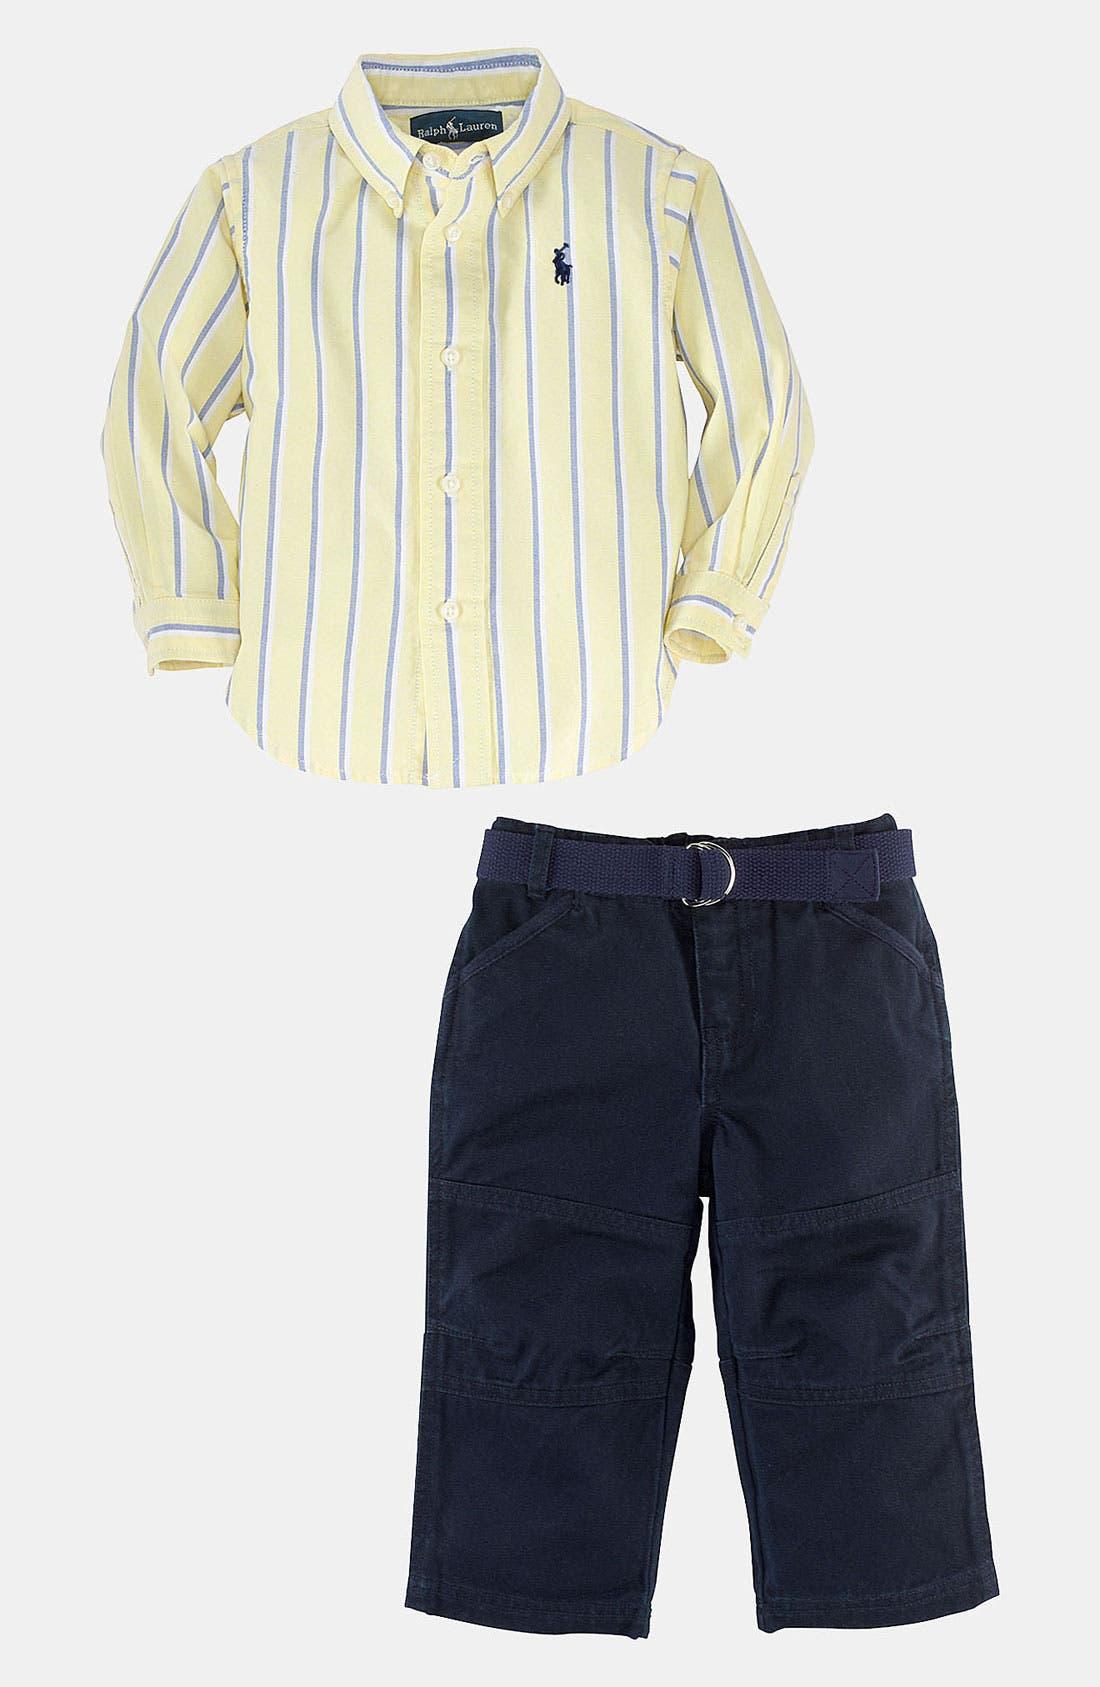 Main Image - Ralph Lauren Stripe Shirt & Pants (Baby)